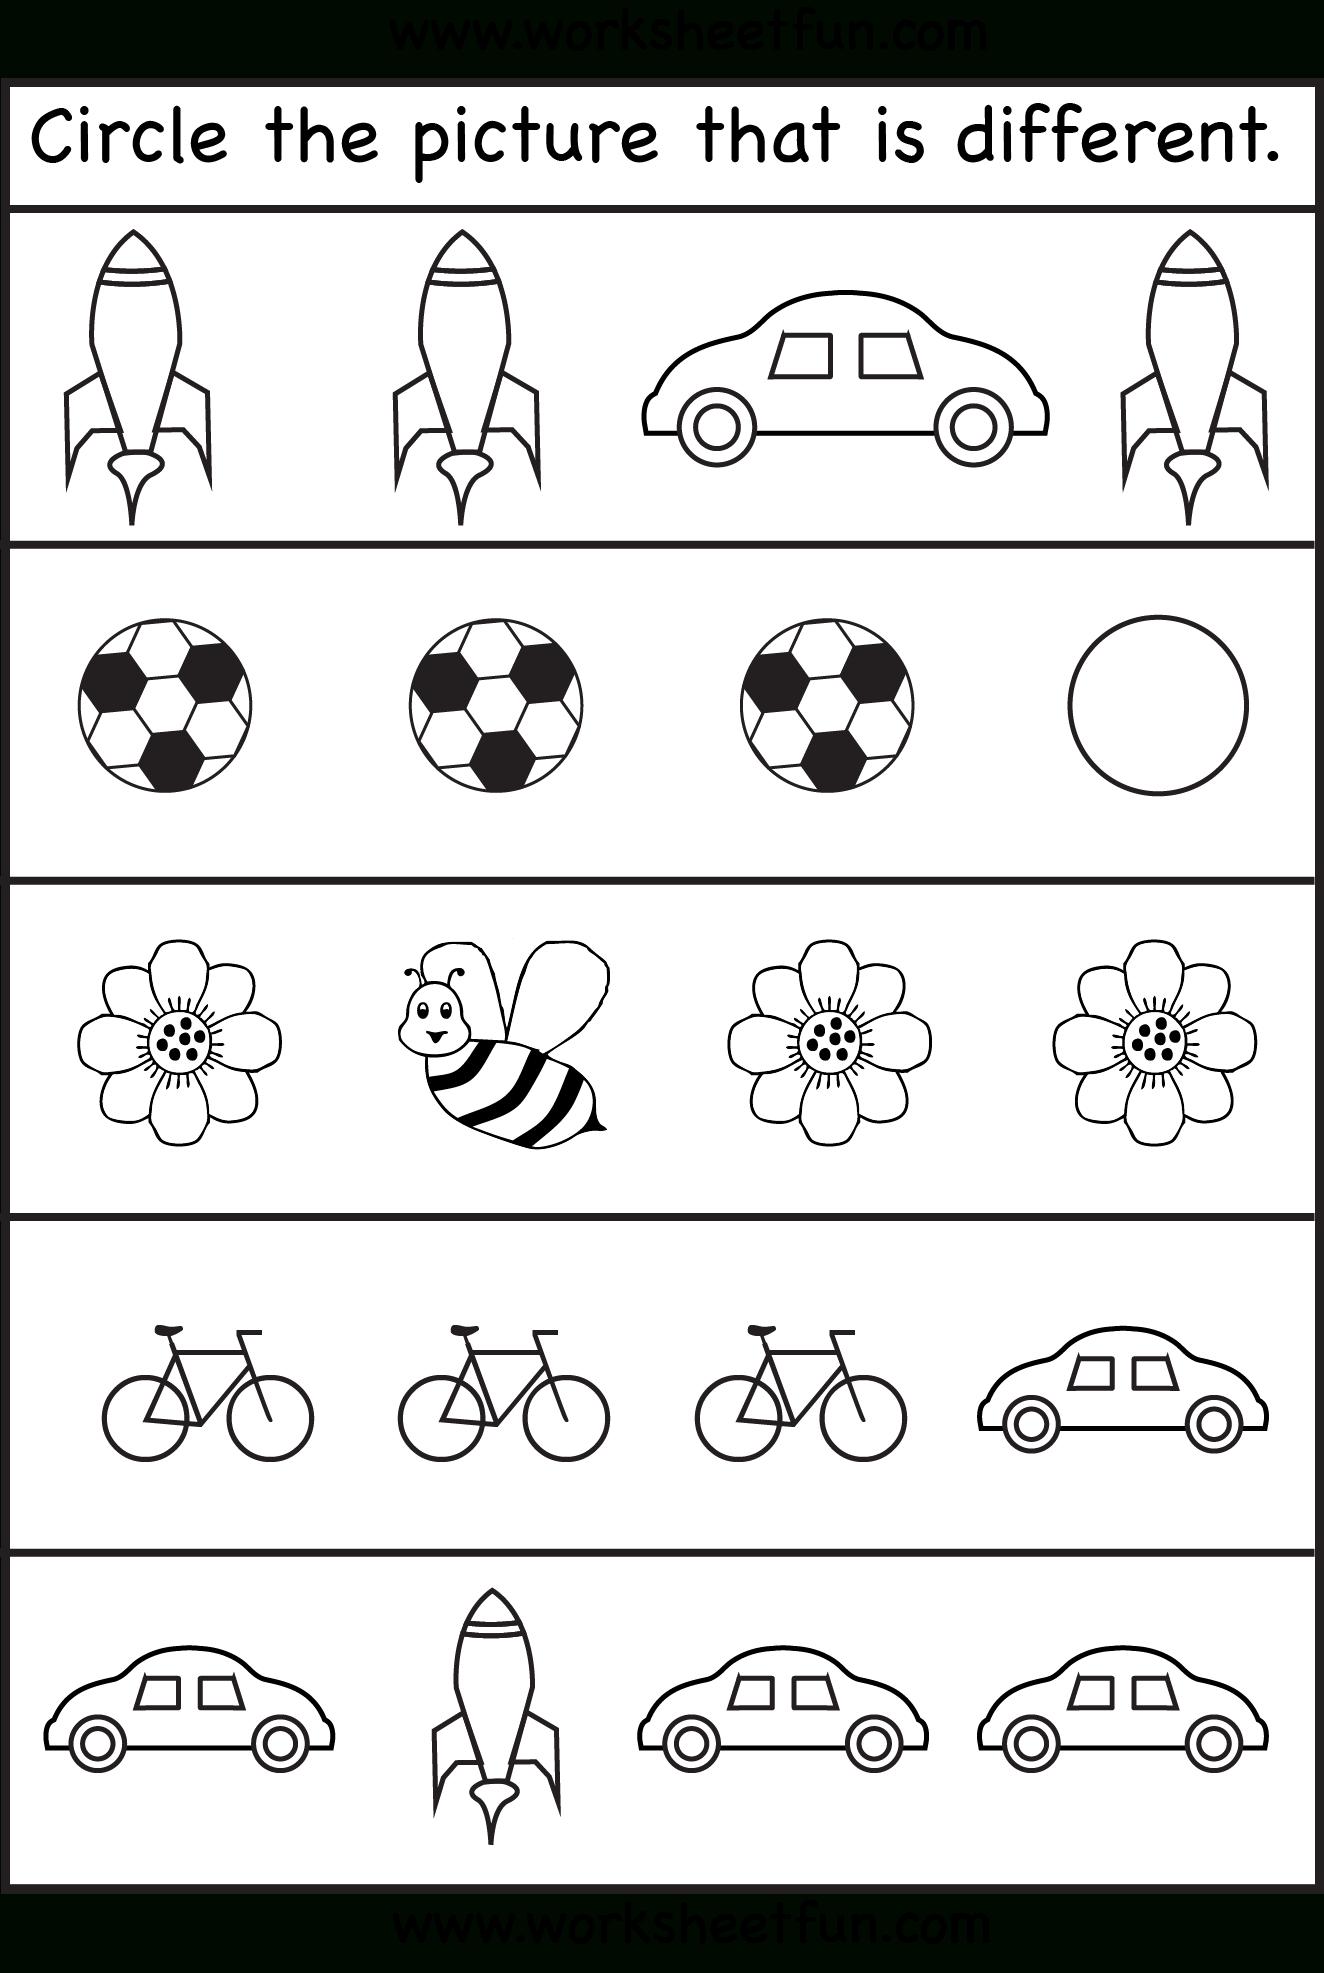 Same Or Different Worksheets For Toddler   Free Preschool